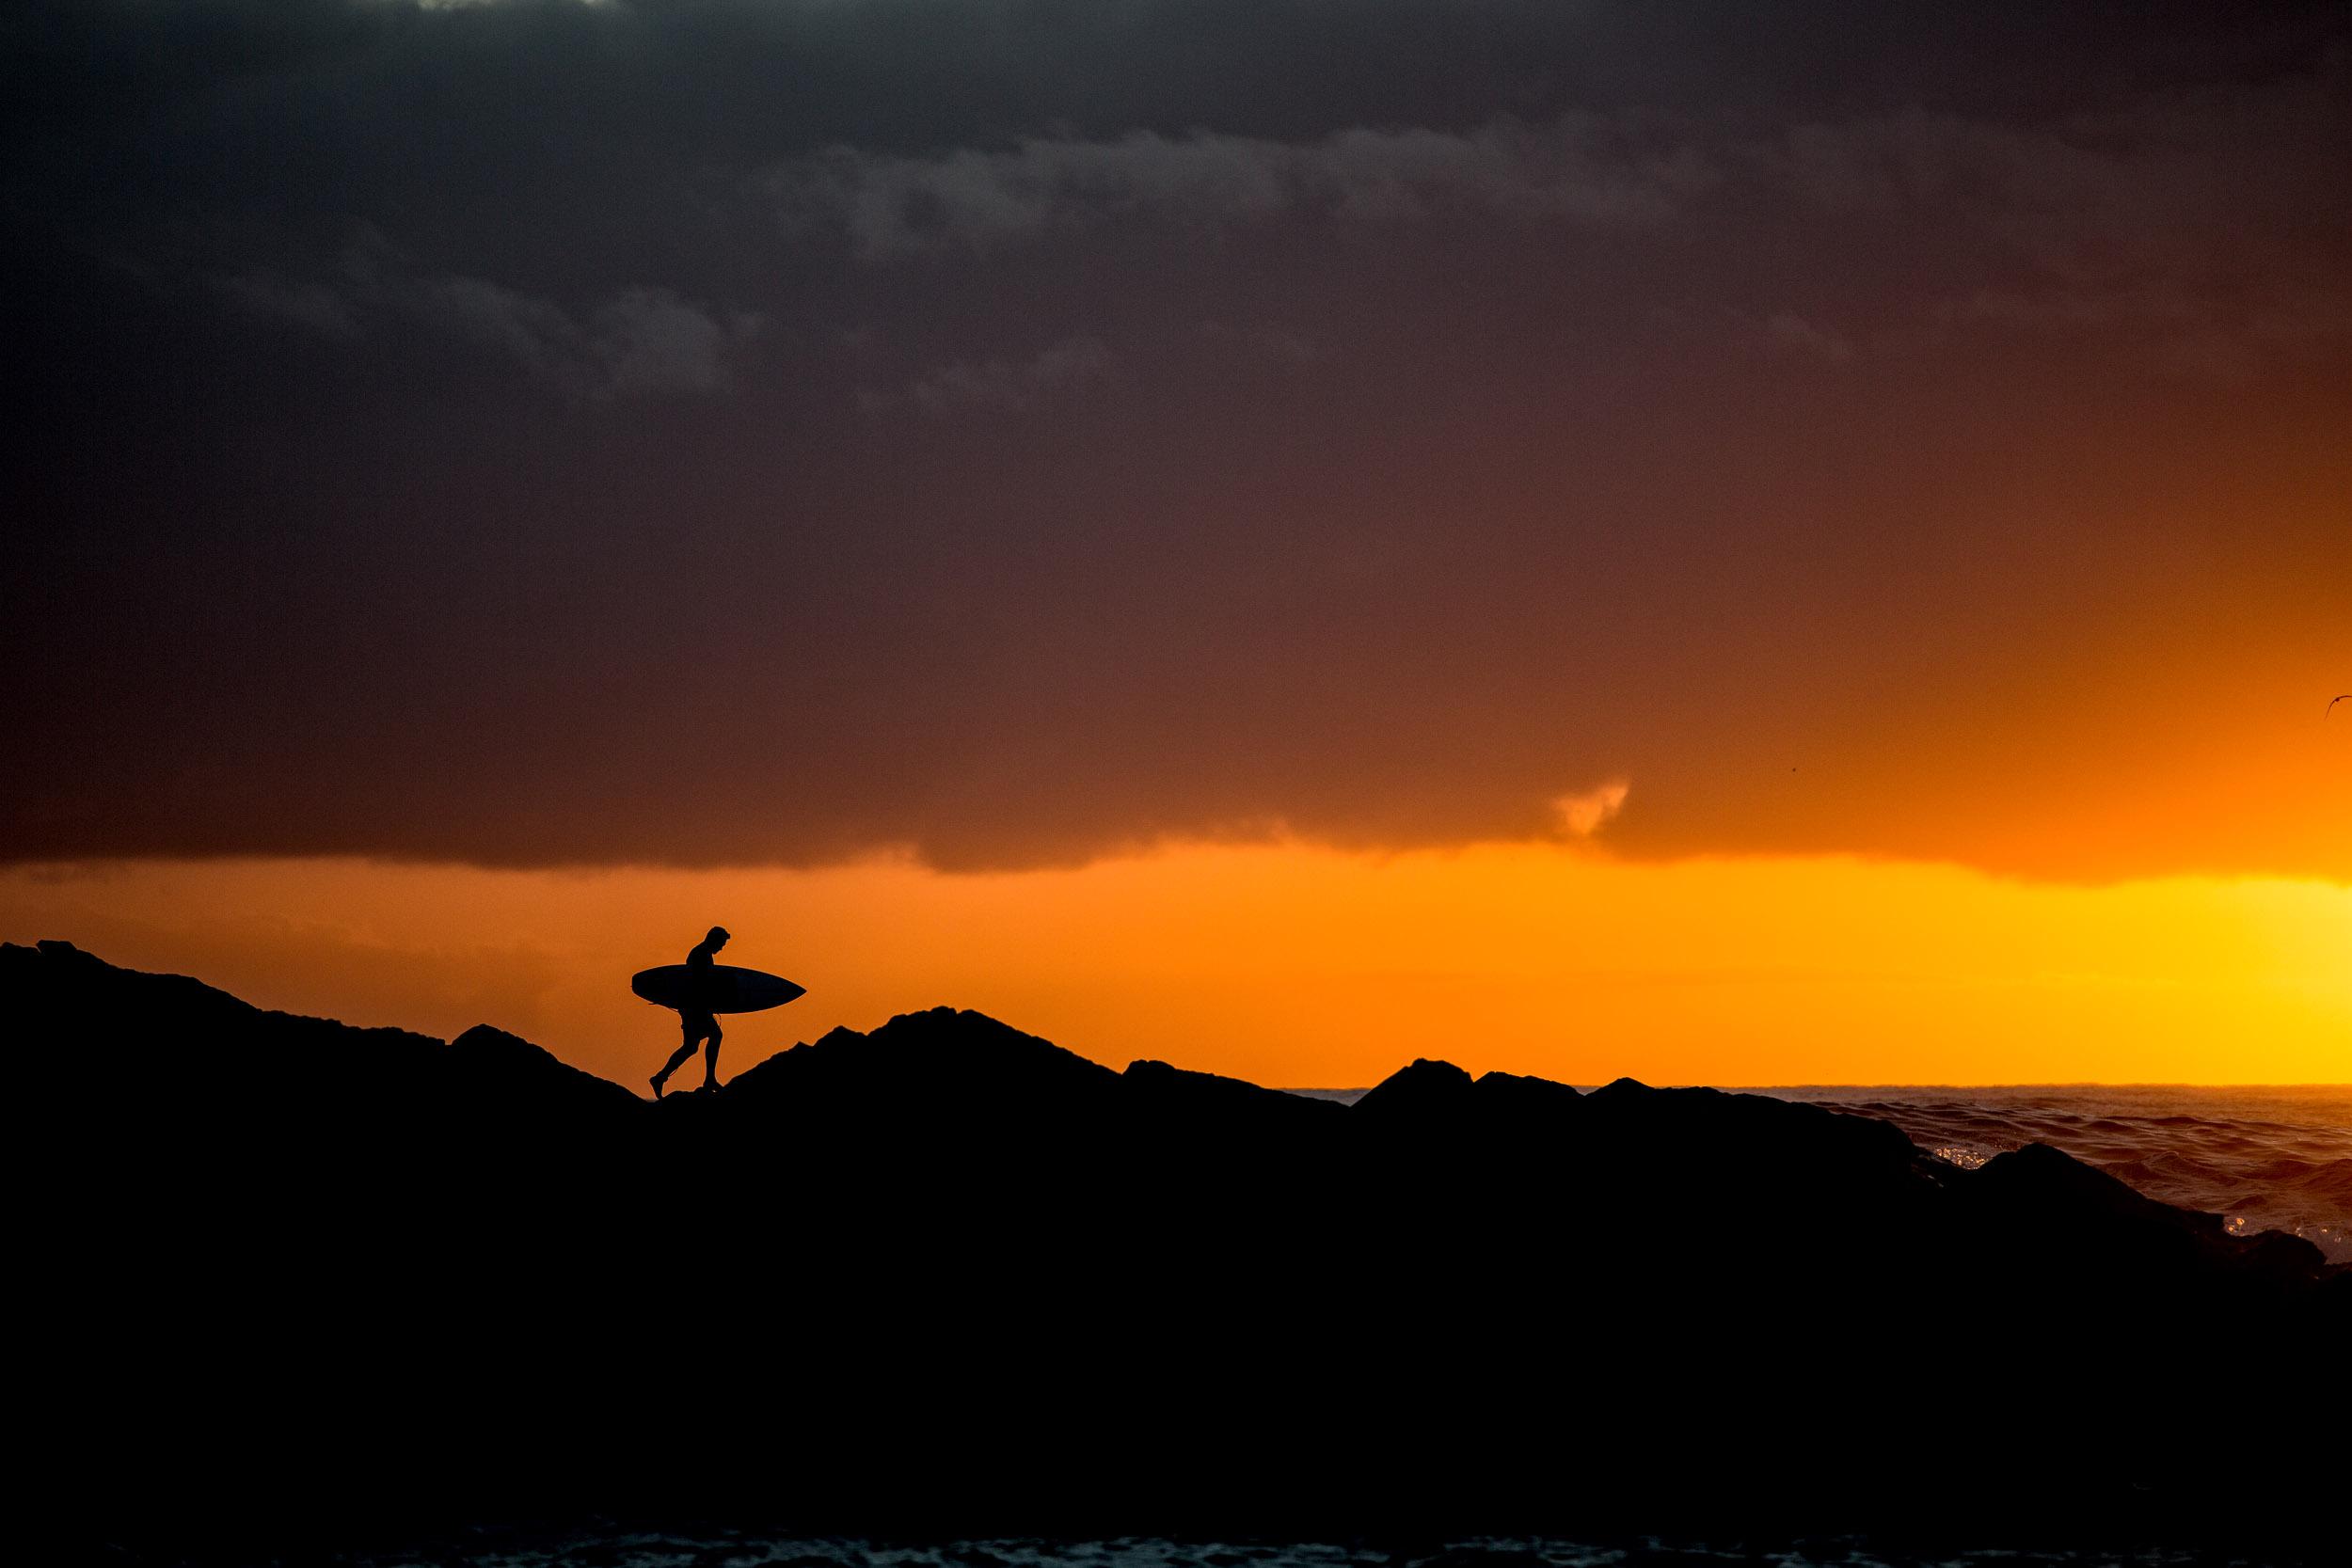 sunrise-surfer-photography-S1290-116.jpg